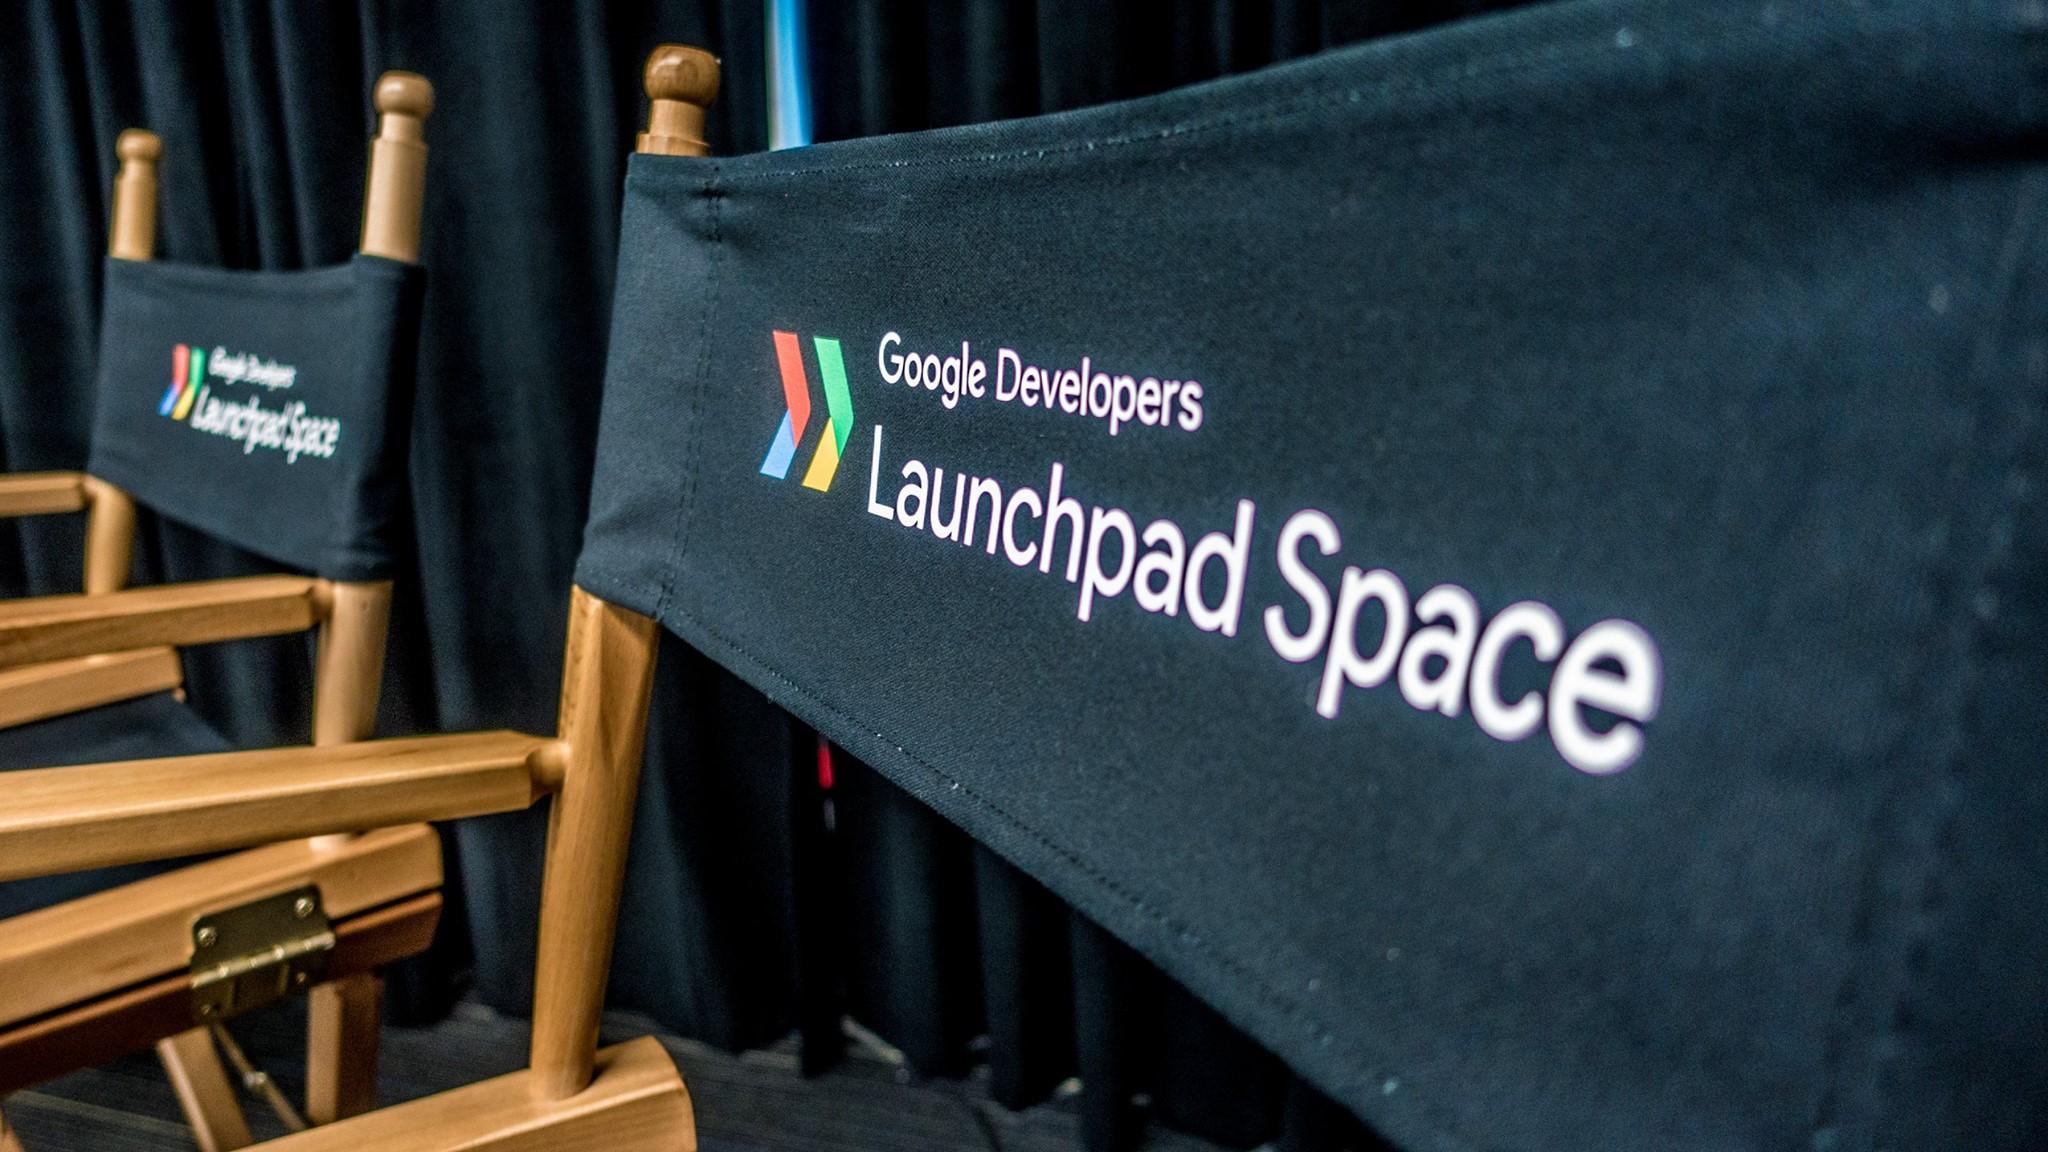 Google Developer Launchpad